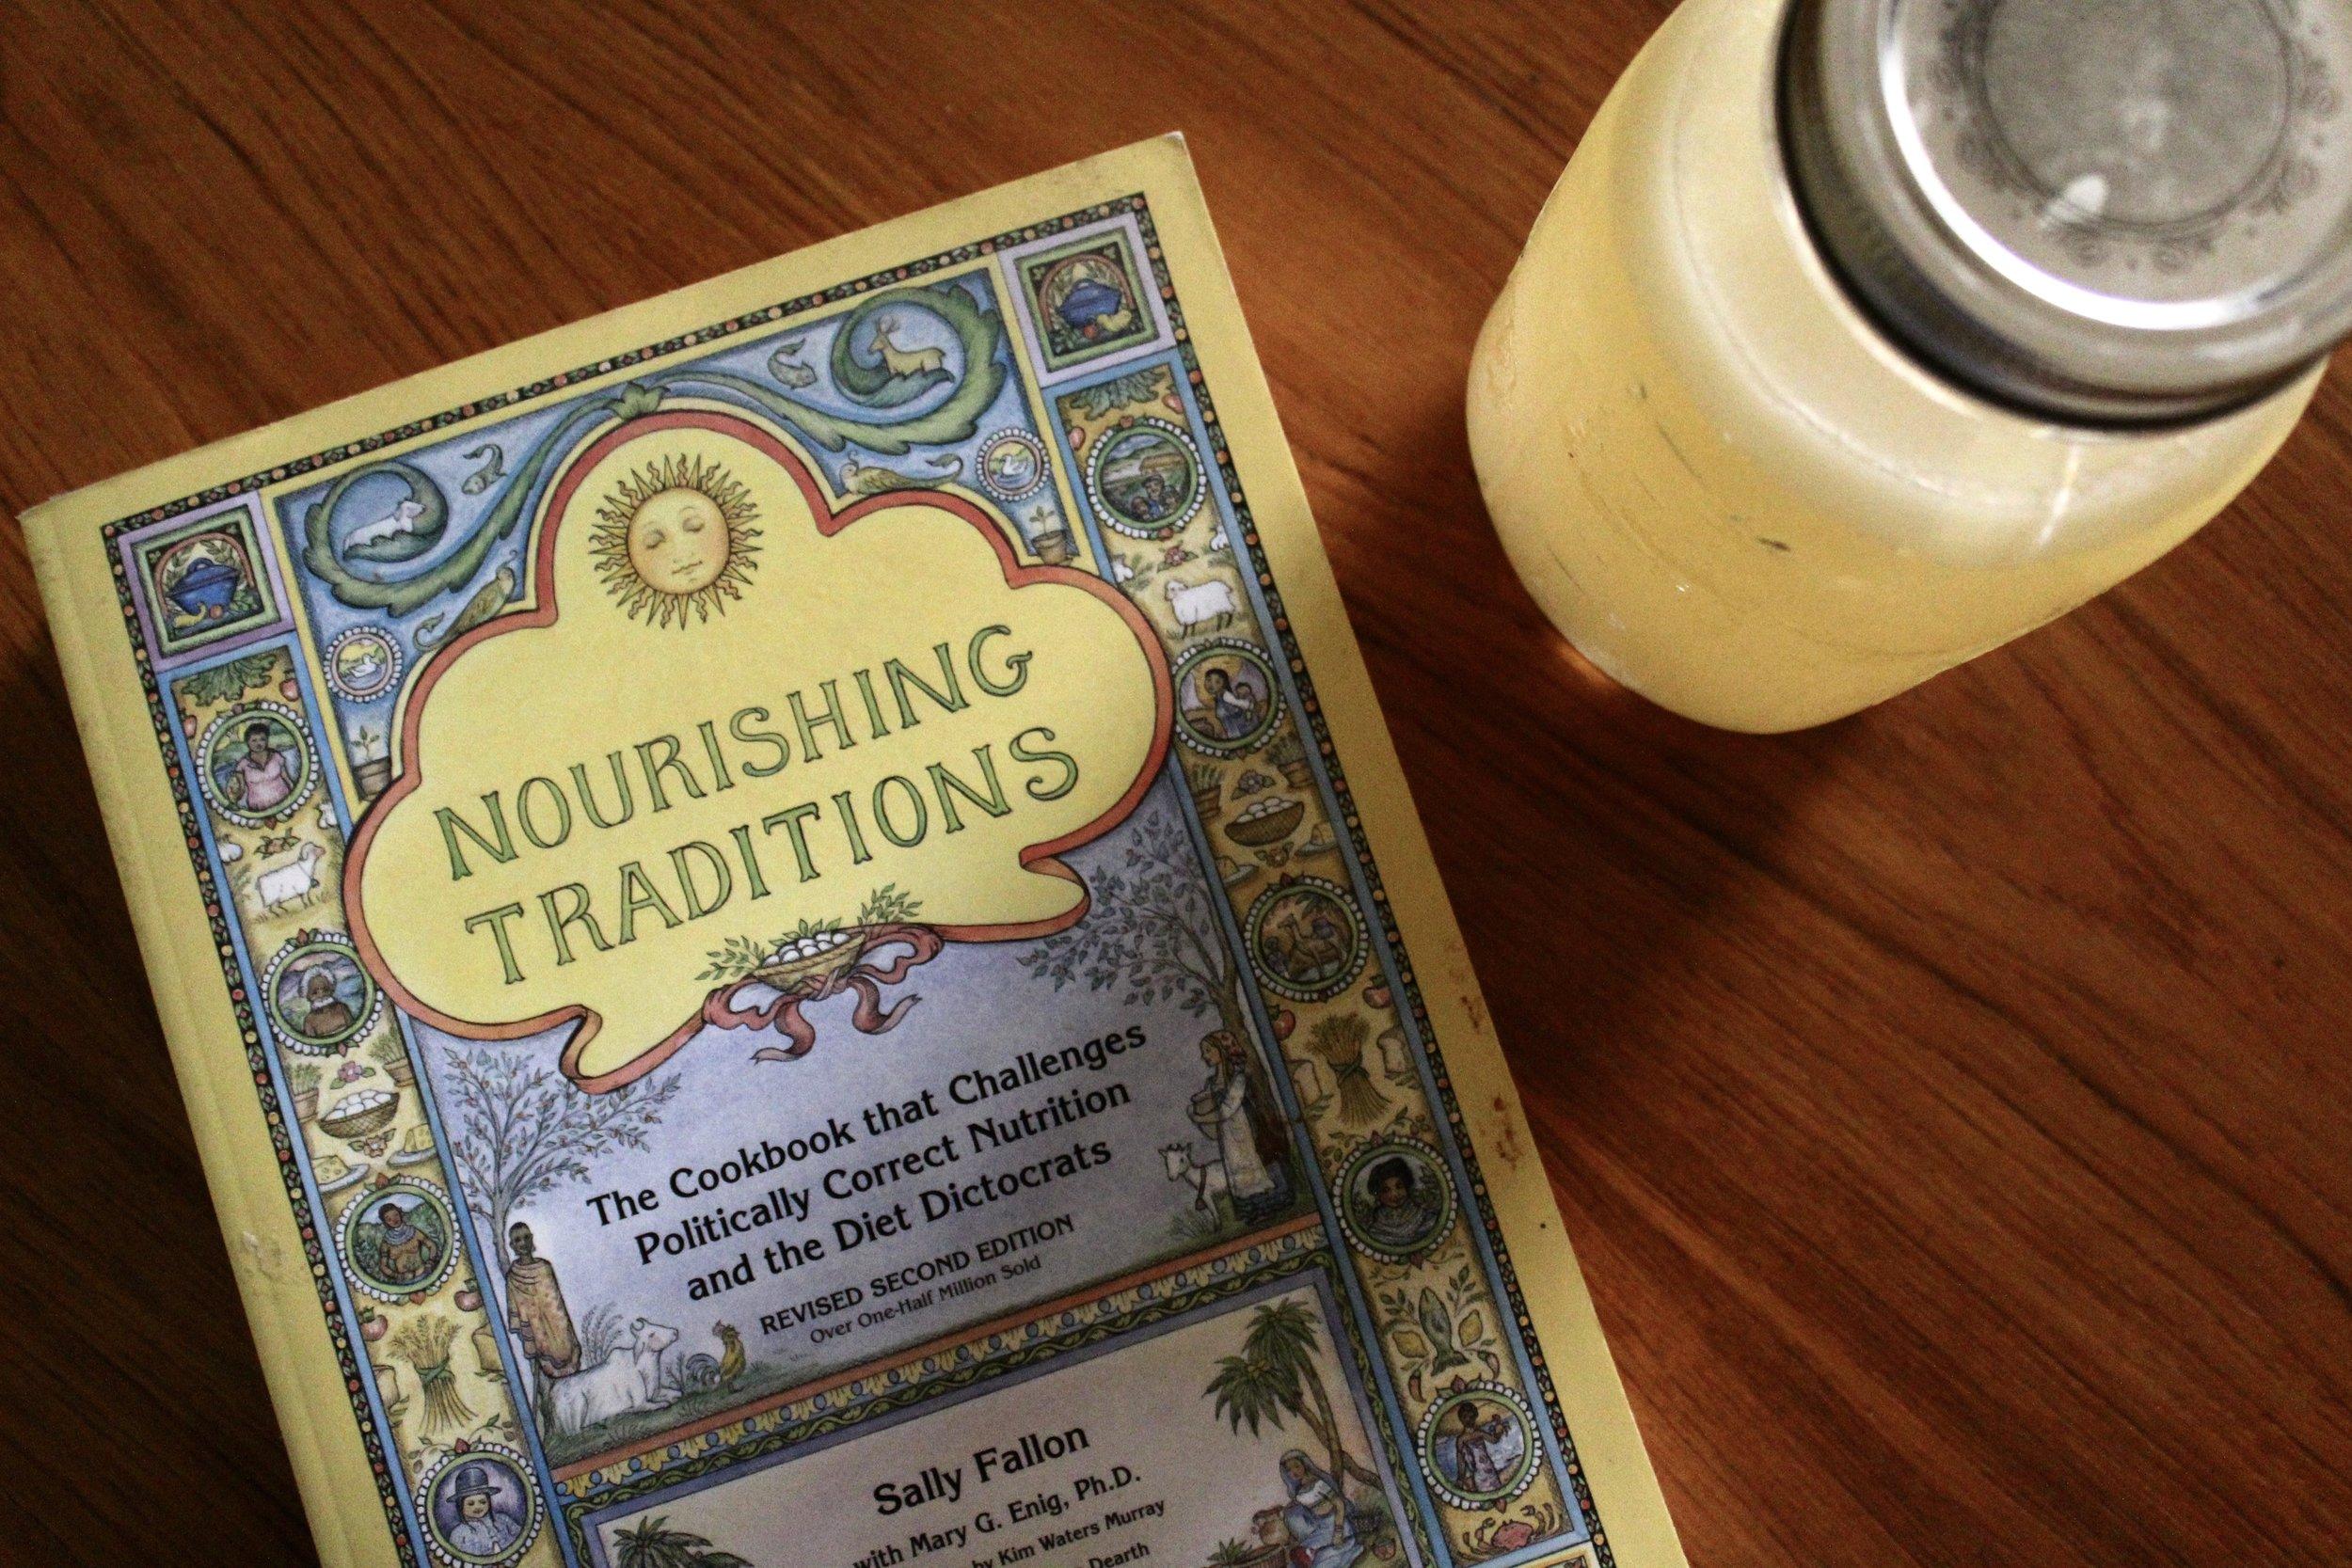 Nourishing-Traditions-cookbook